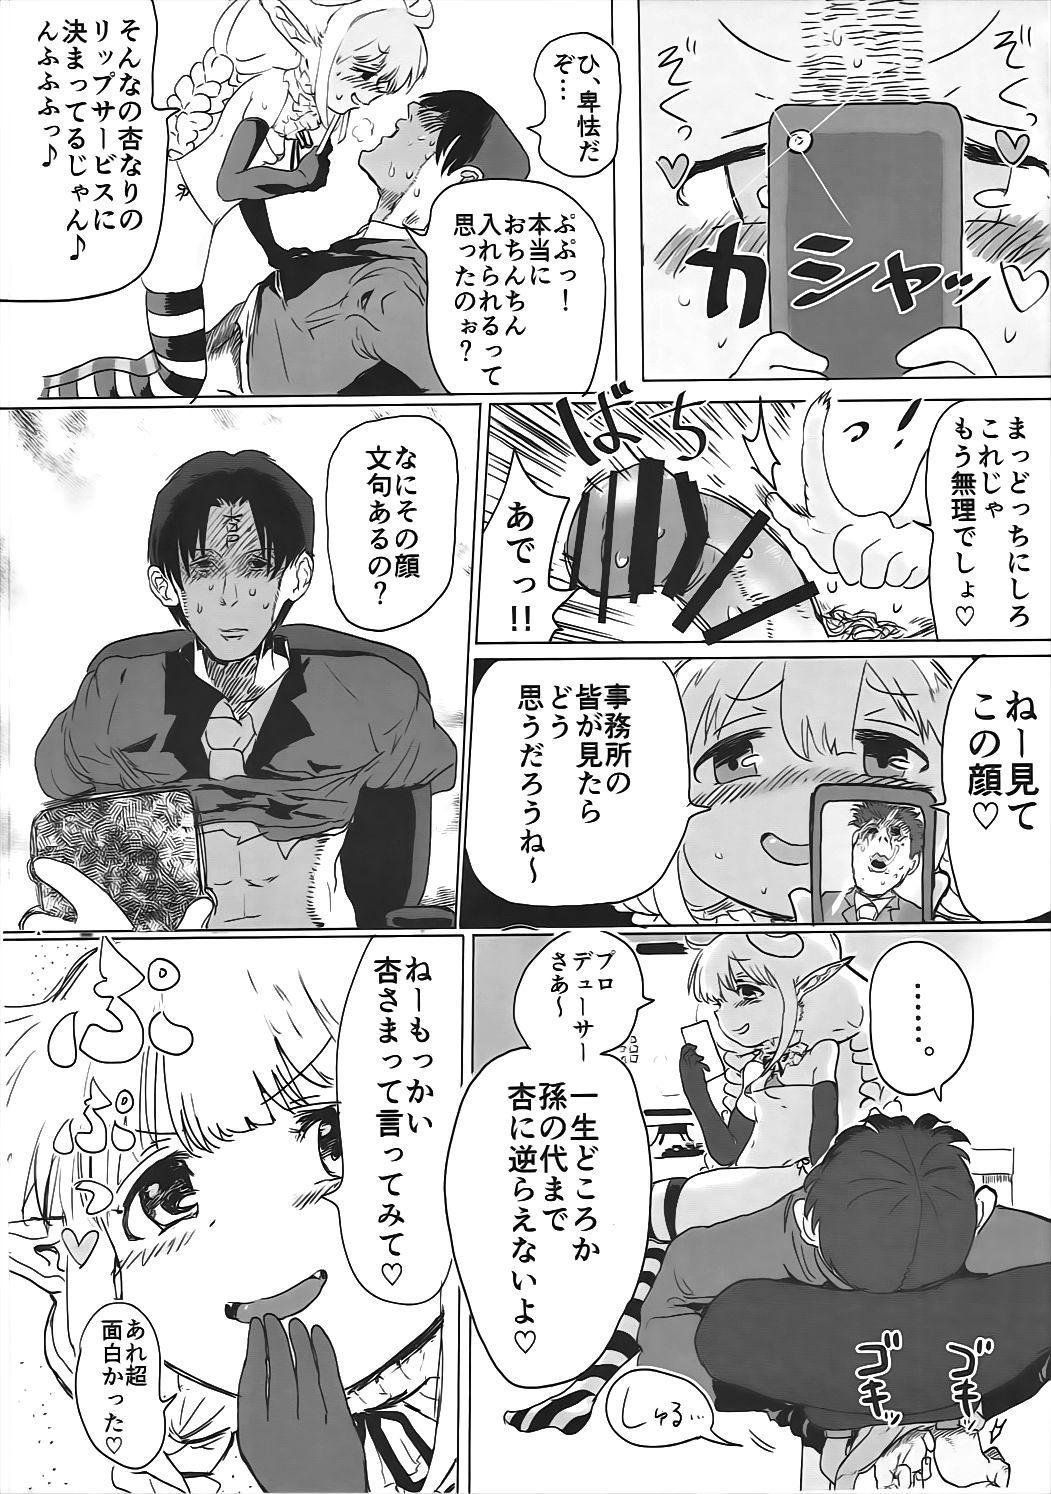 Anzu-chan to Mechakucha 28